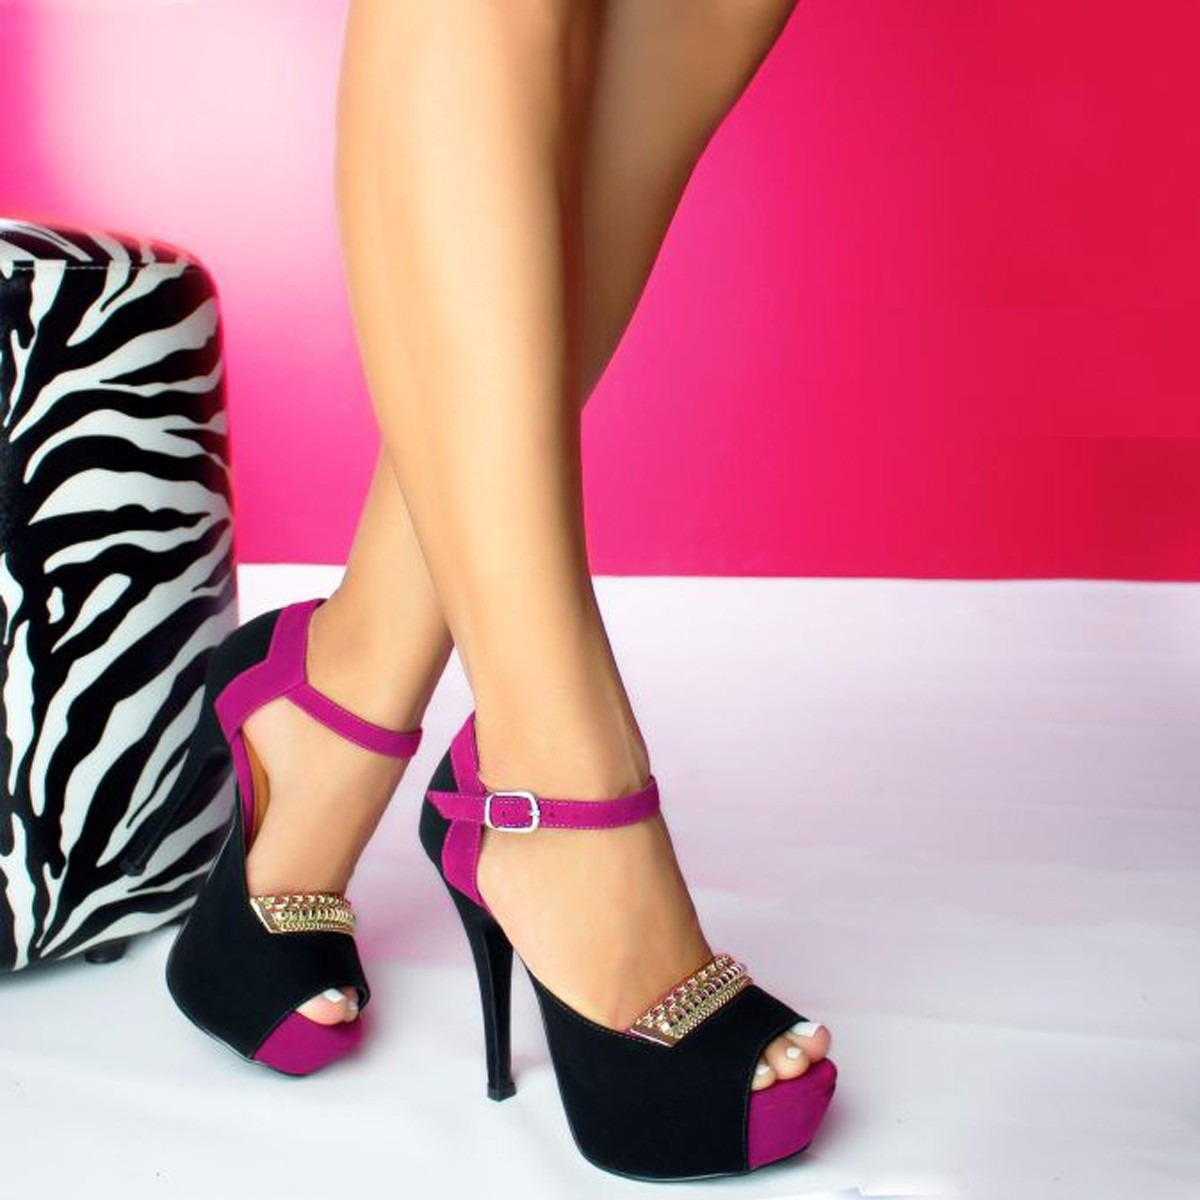 ca260a7f35 lindo sapato feminino scarpin salto alto festa balada top. Carregando zoom.